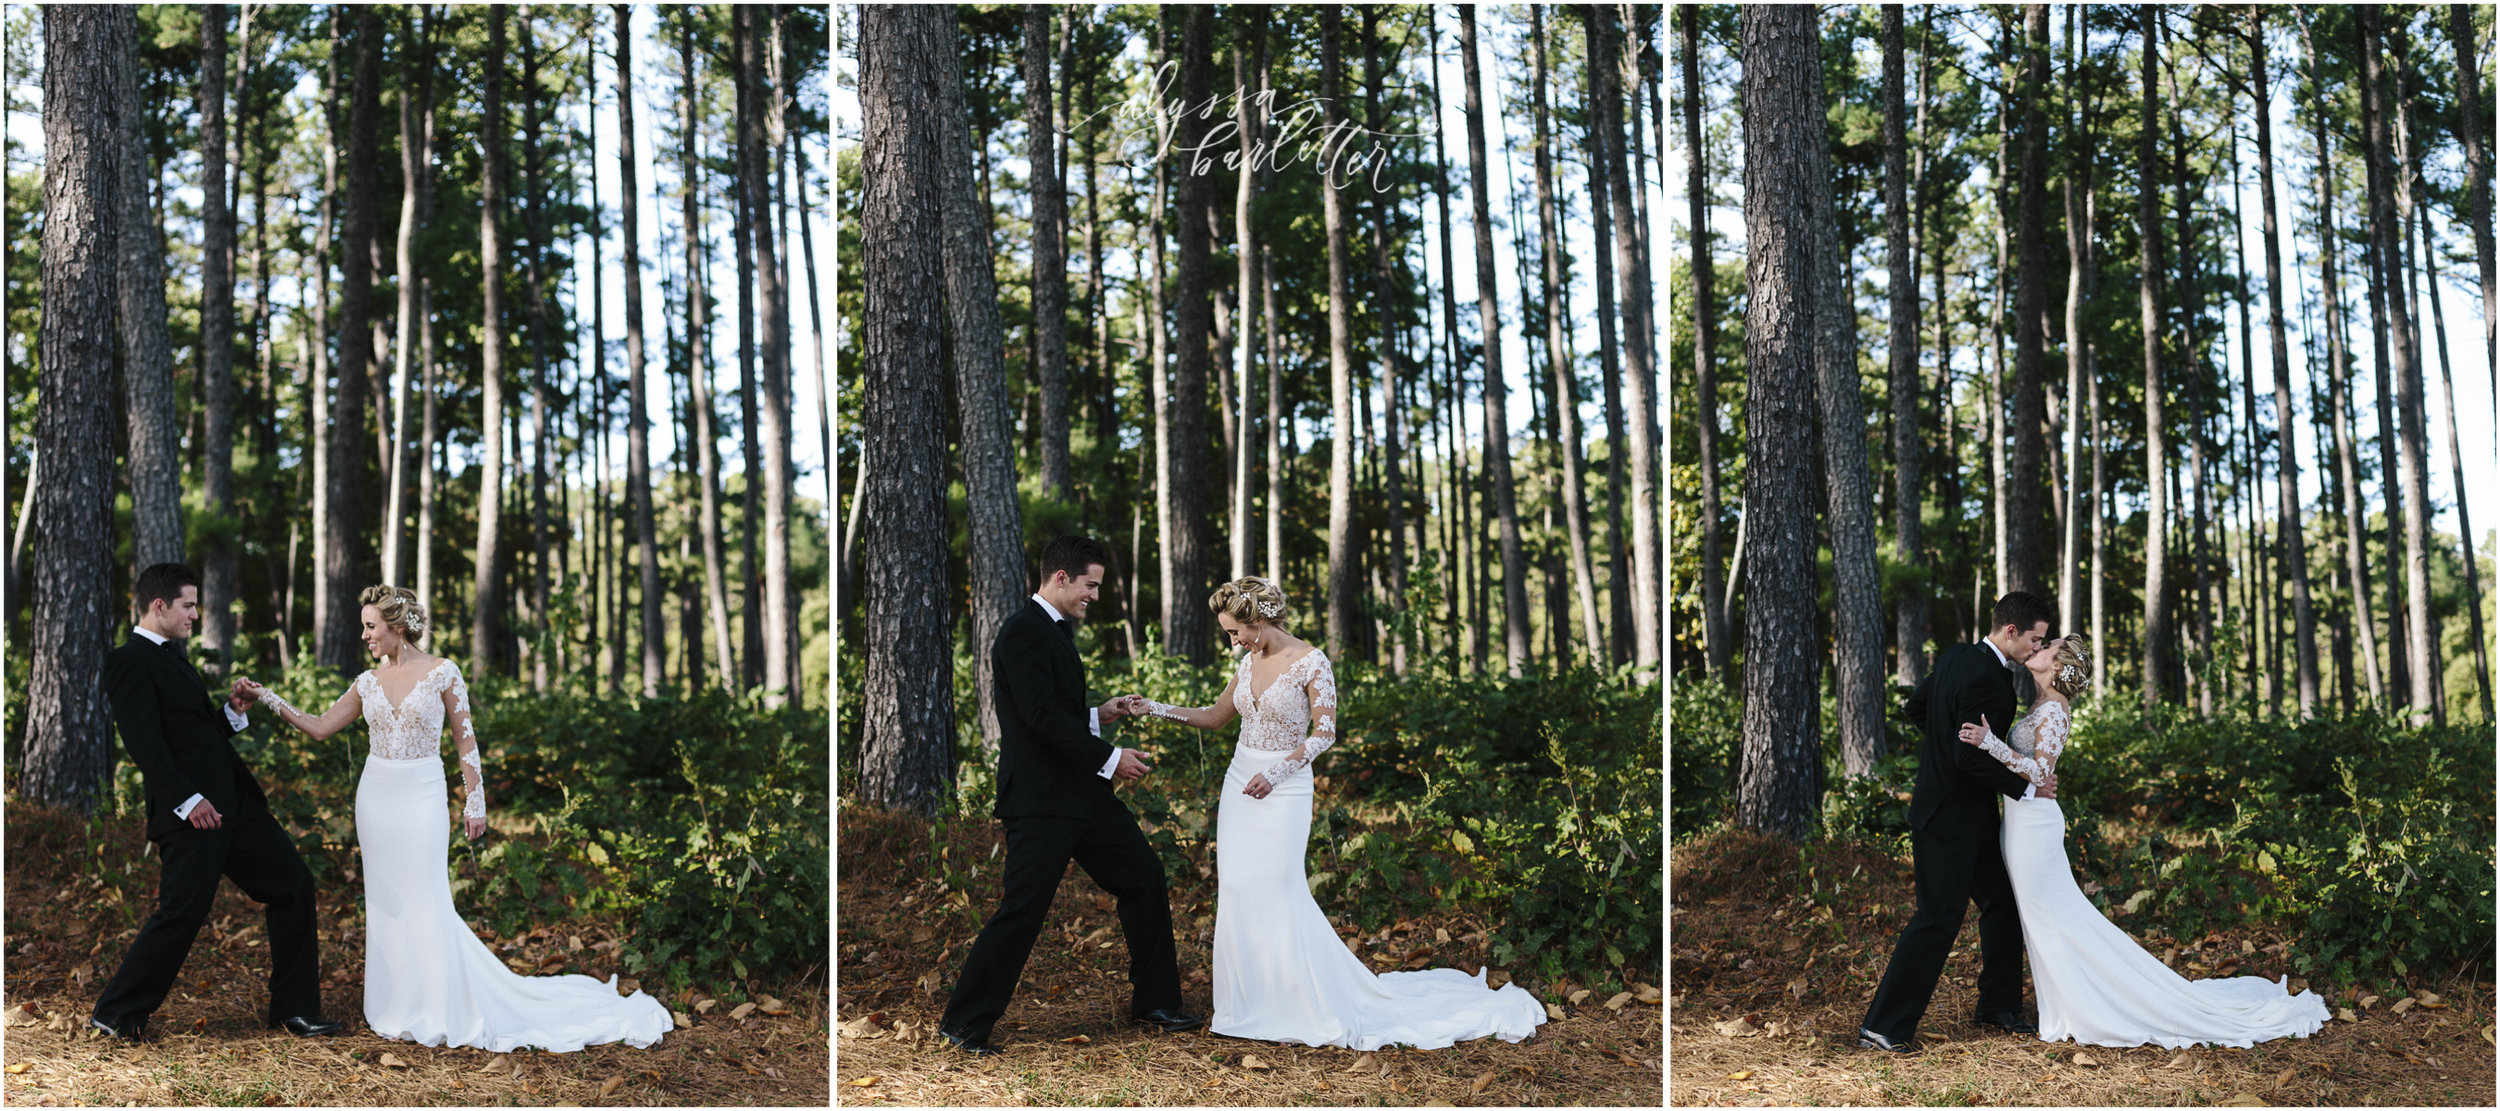 alyssa barletter photography fayetteville arkansas wedding photos micah and colin-1-30.jpg